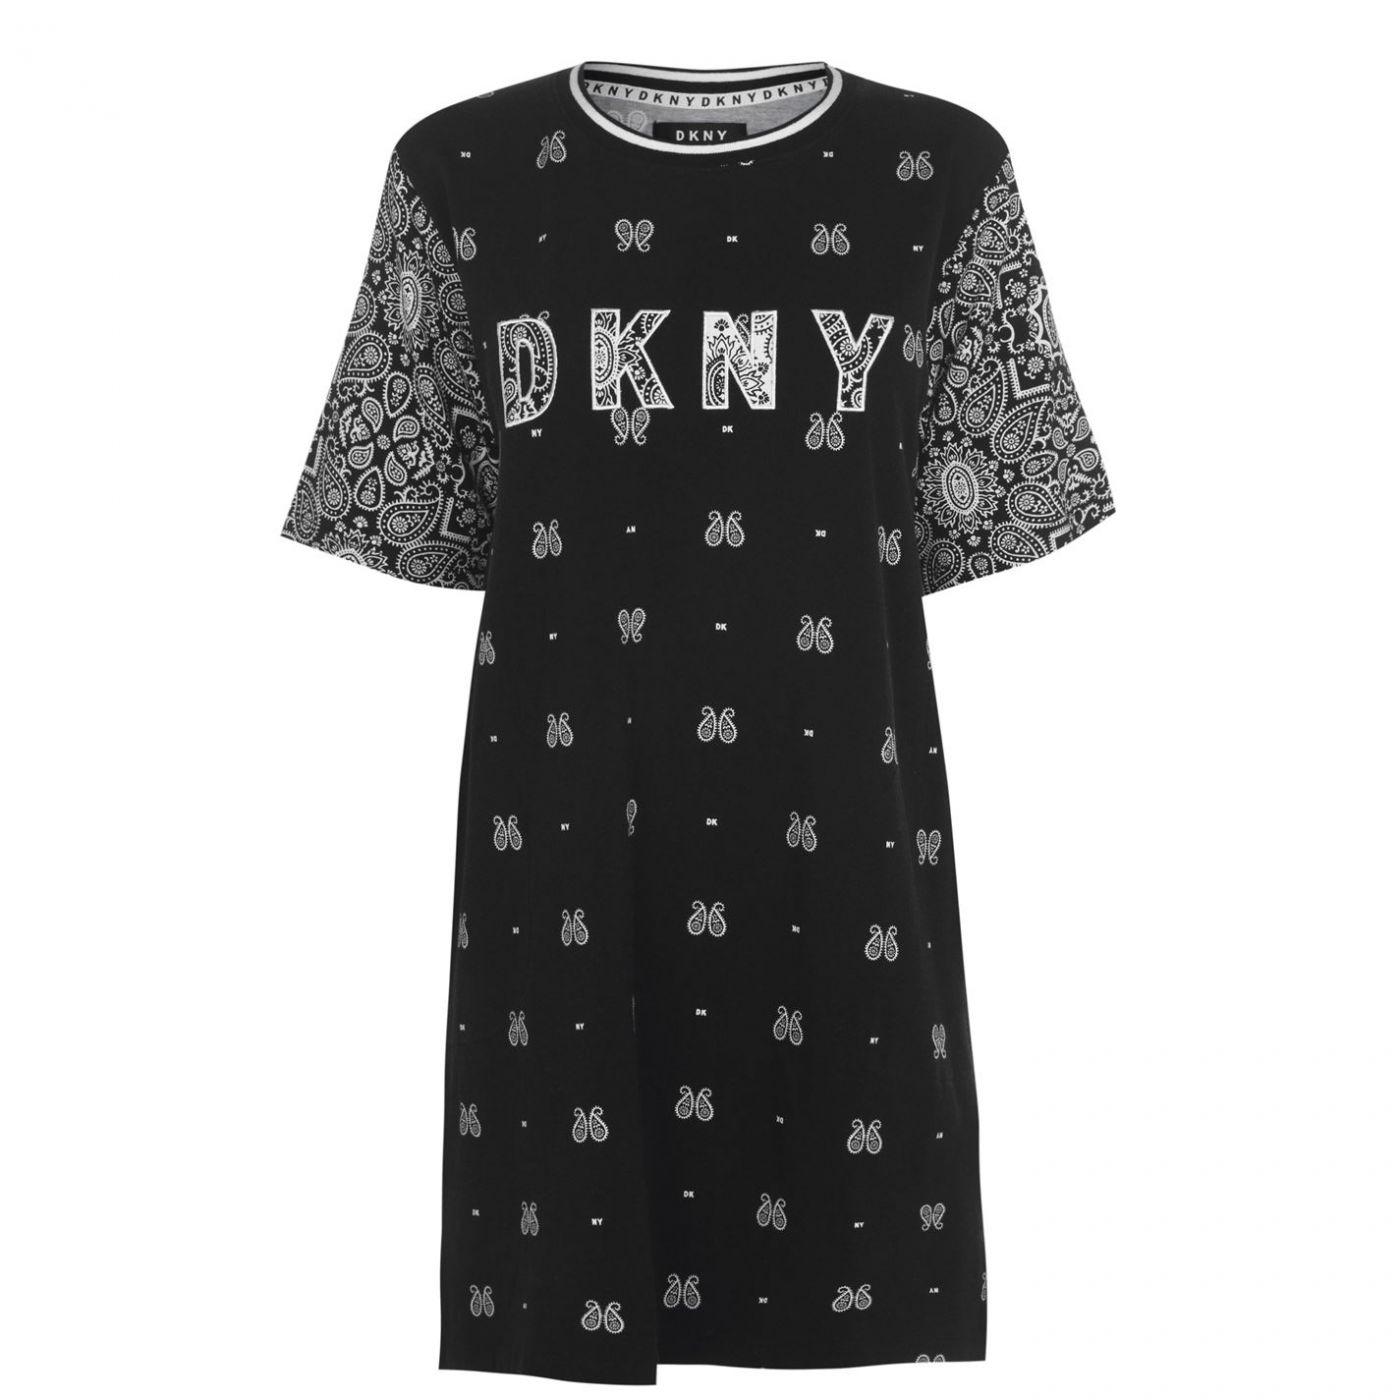 DKNY Bandanna Sleep Shirt